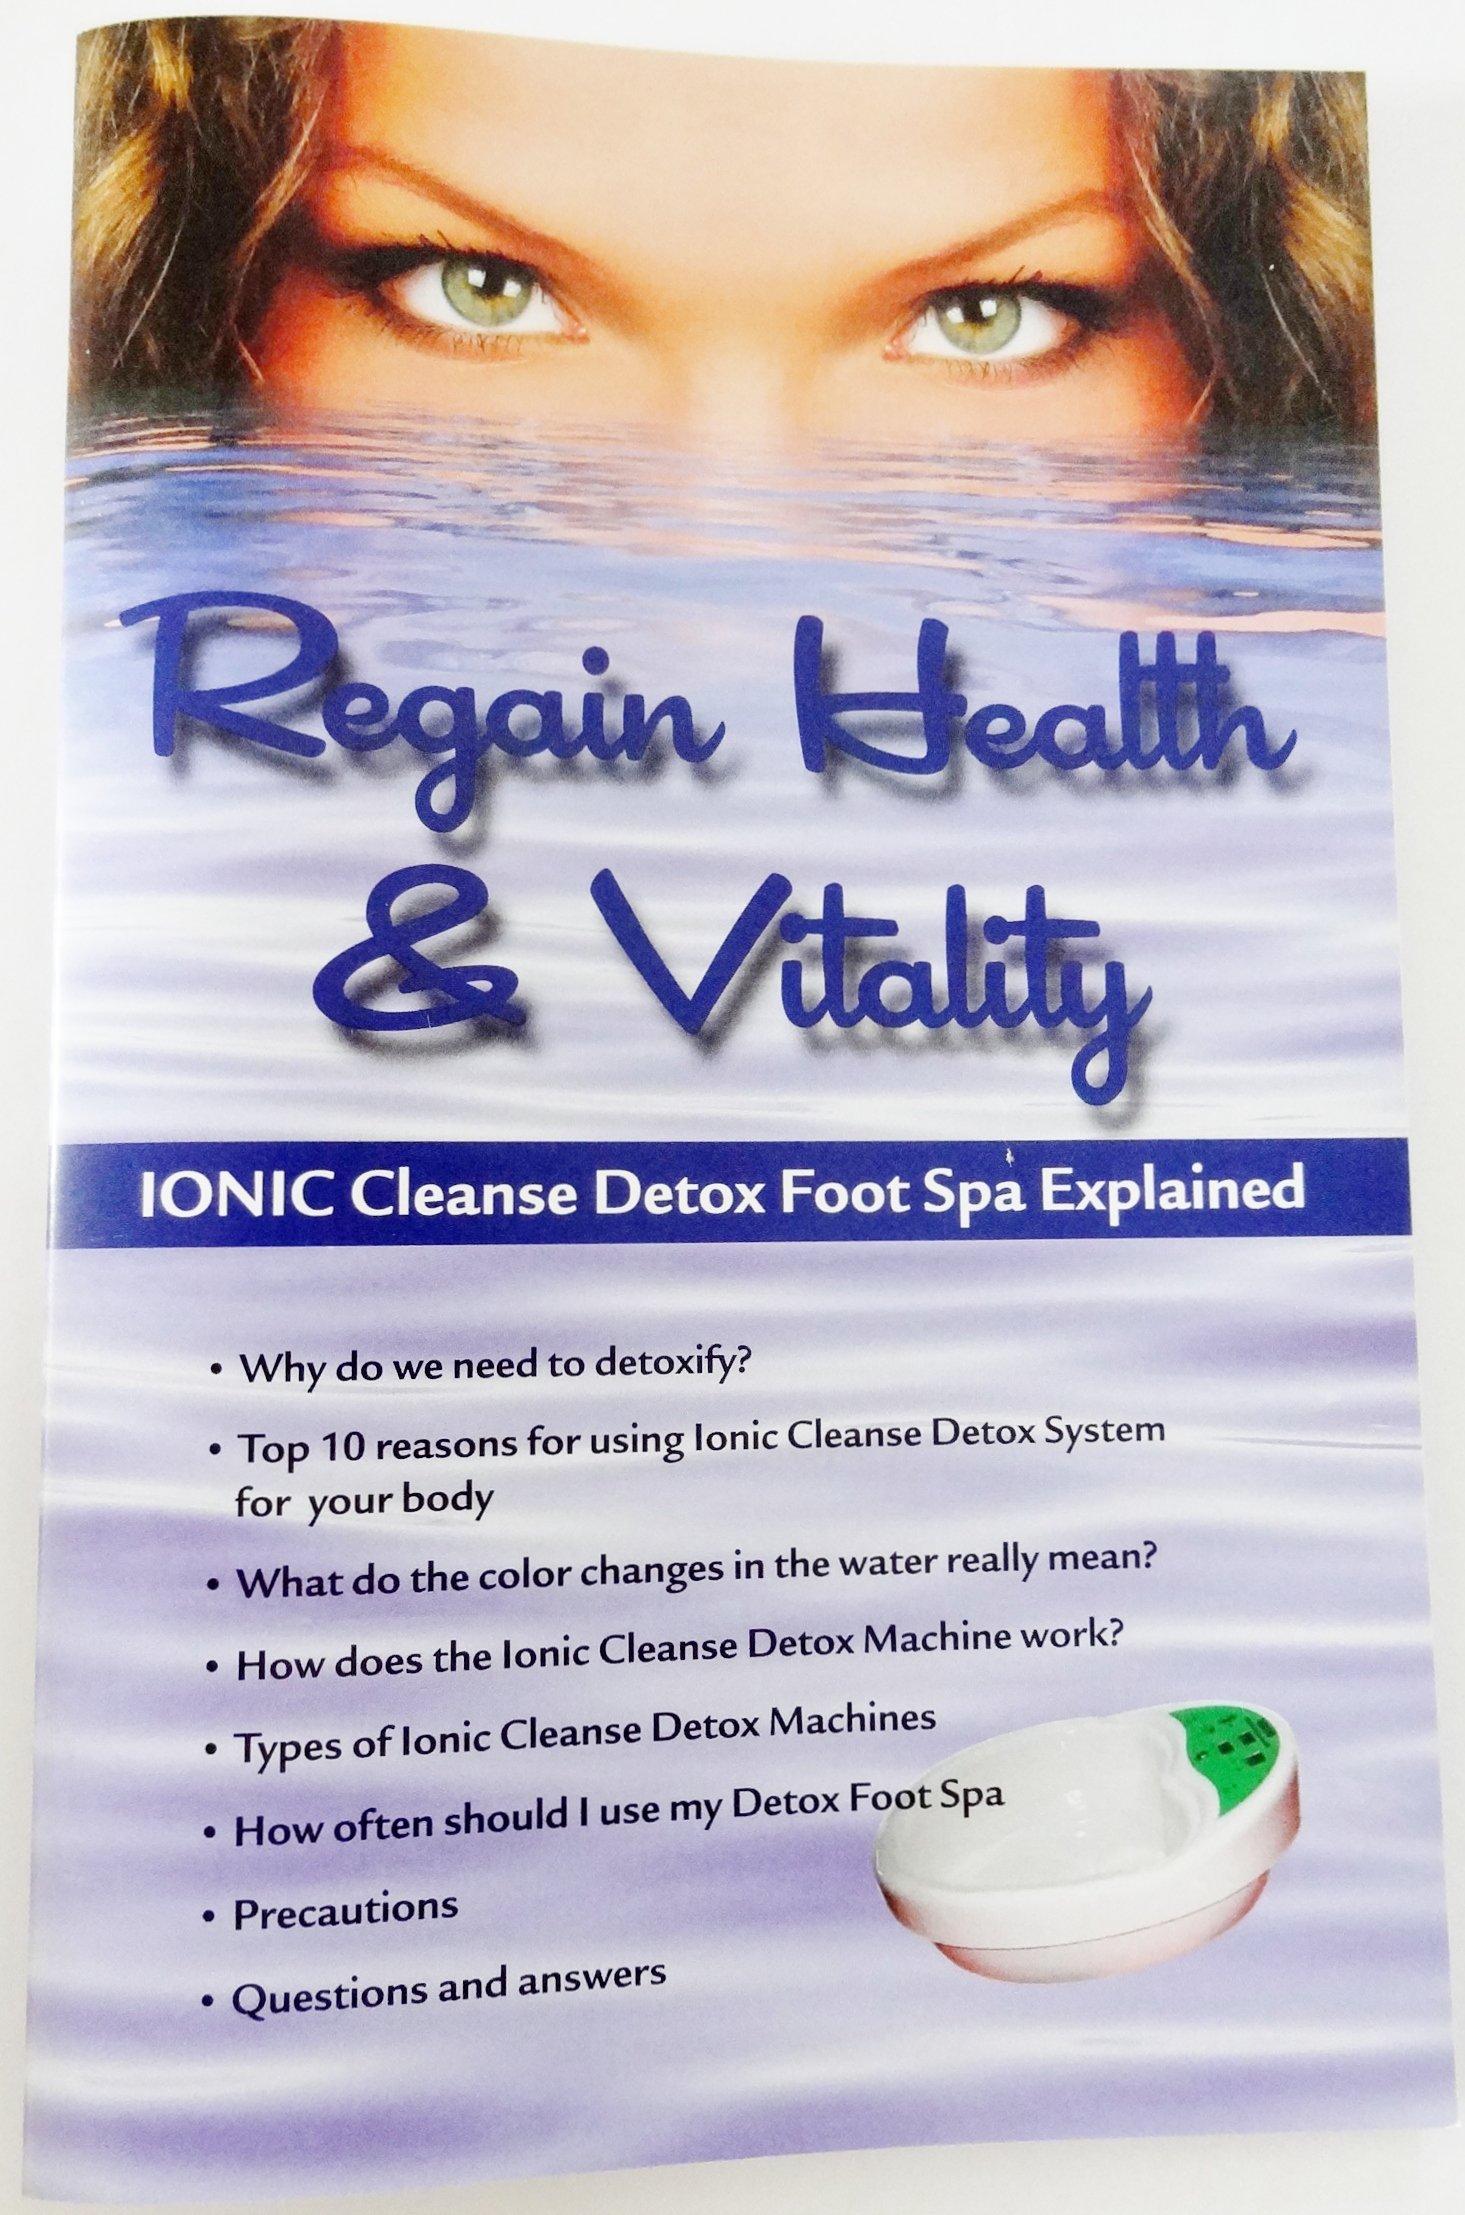 Ionic Foot Cleanse. Detox Foot Spa Bath. Detox Foot Spa Machine. Acrylic Foot Basin (A $40.00 Value). Free Regain Health & Vitality Booklet & Brochure.